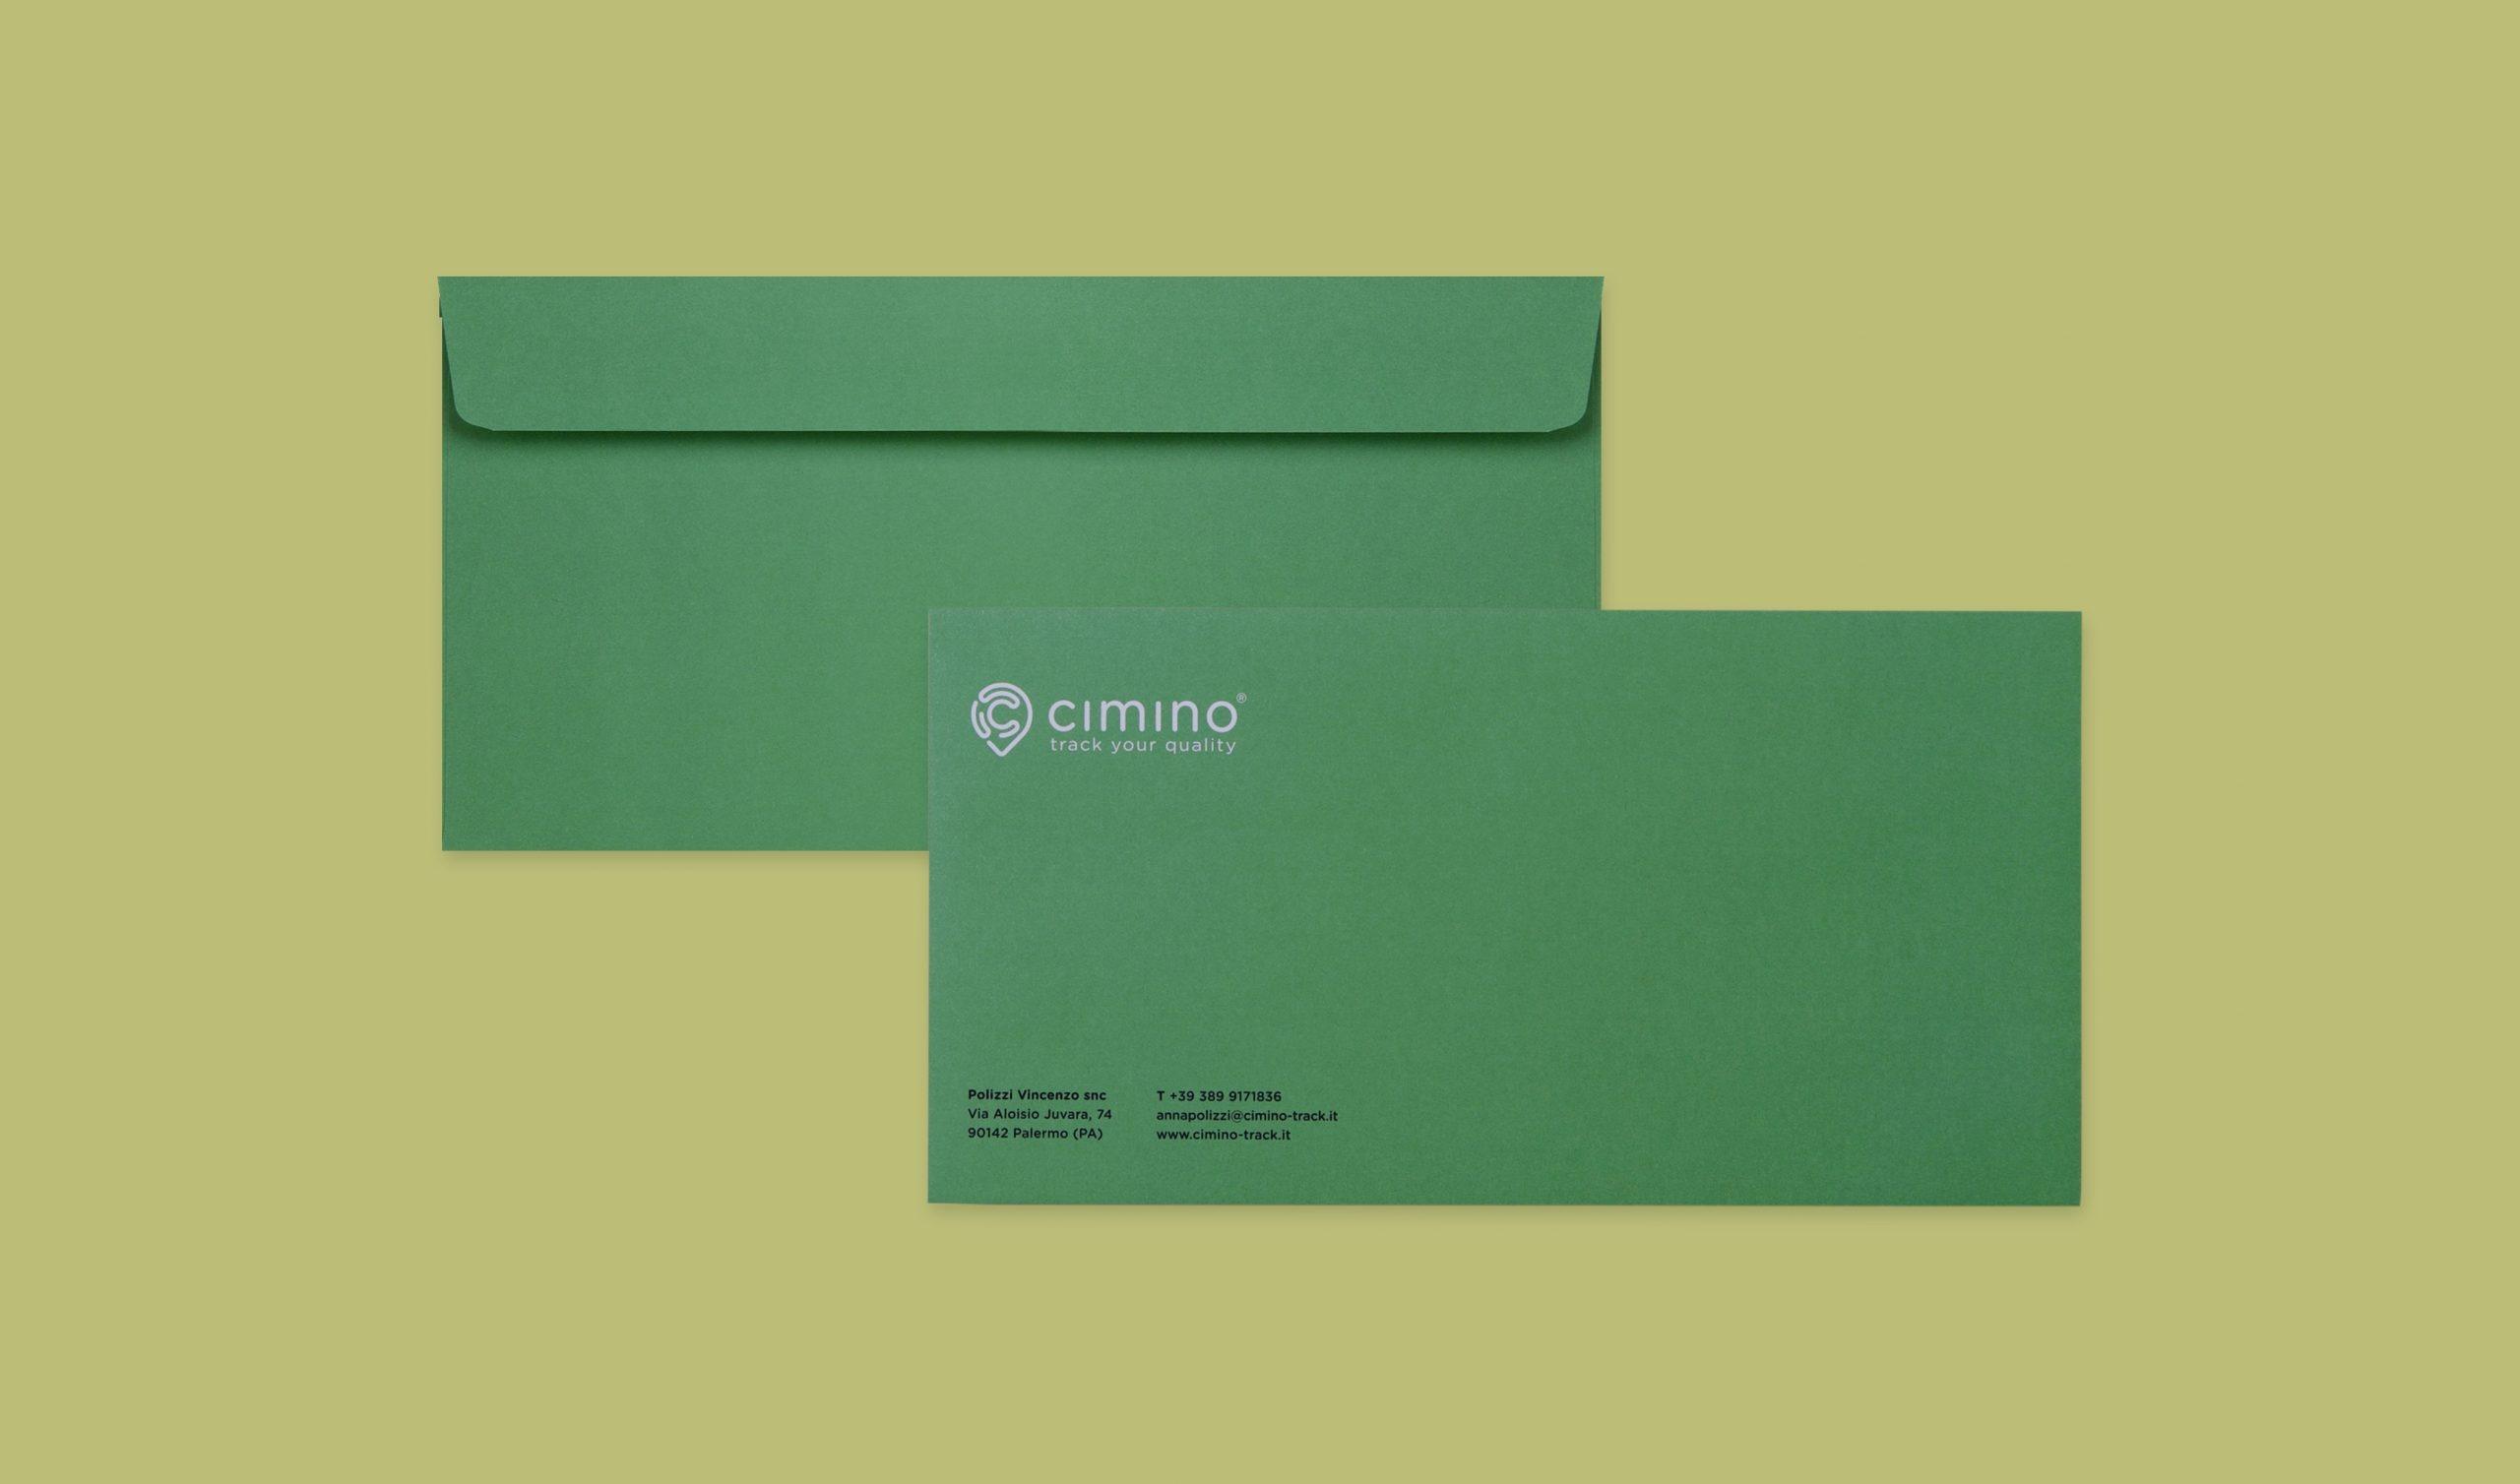 Cimino App - Busta americana